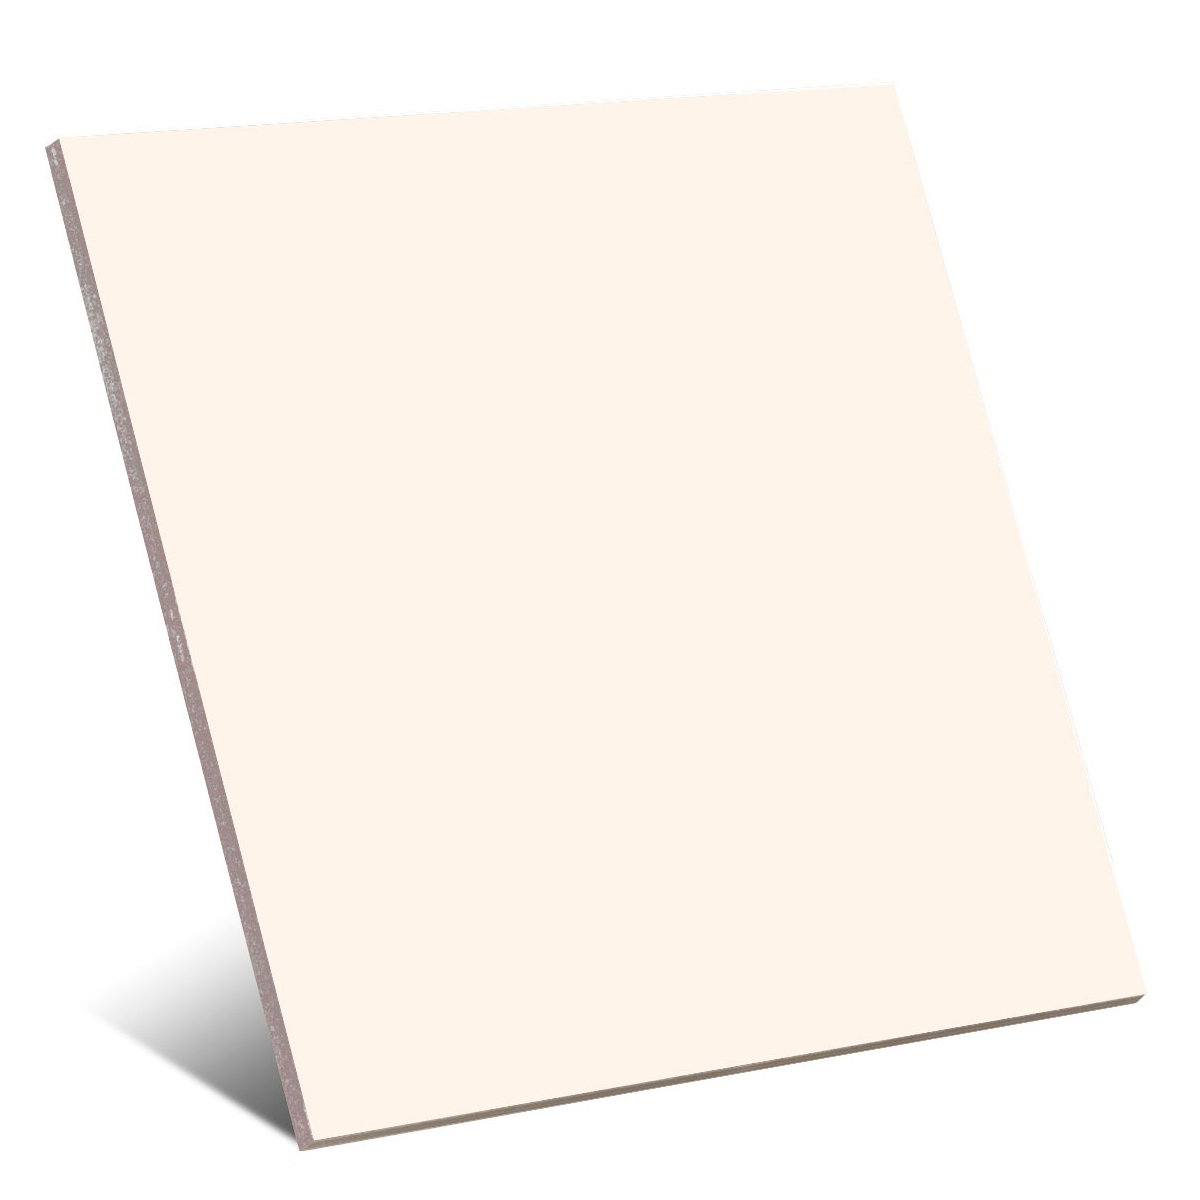 Victorian Blanco Liso 20x20 (m2)